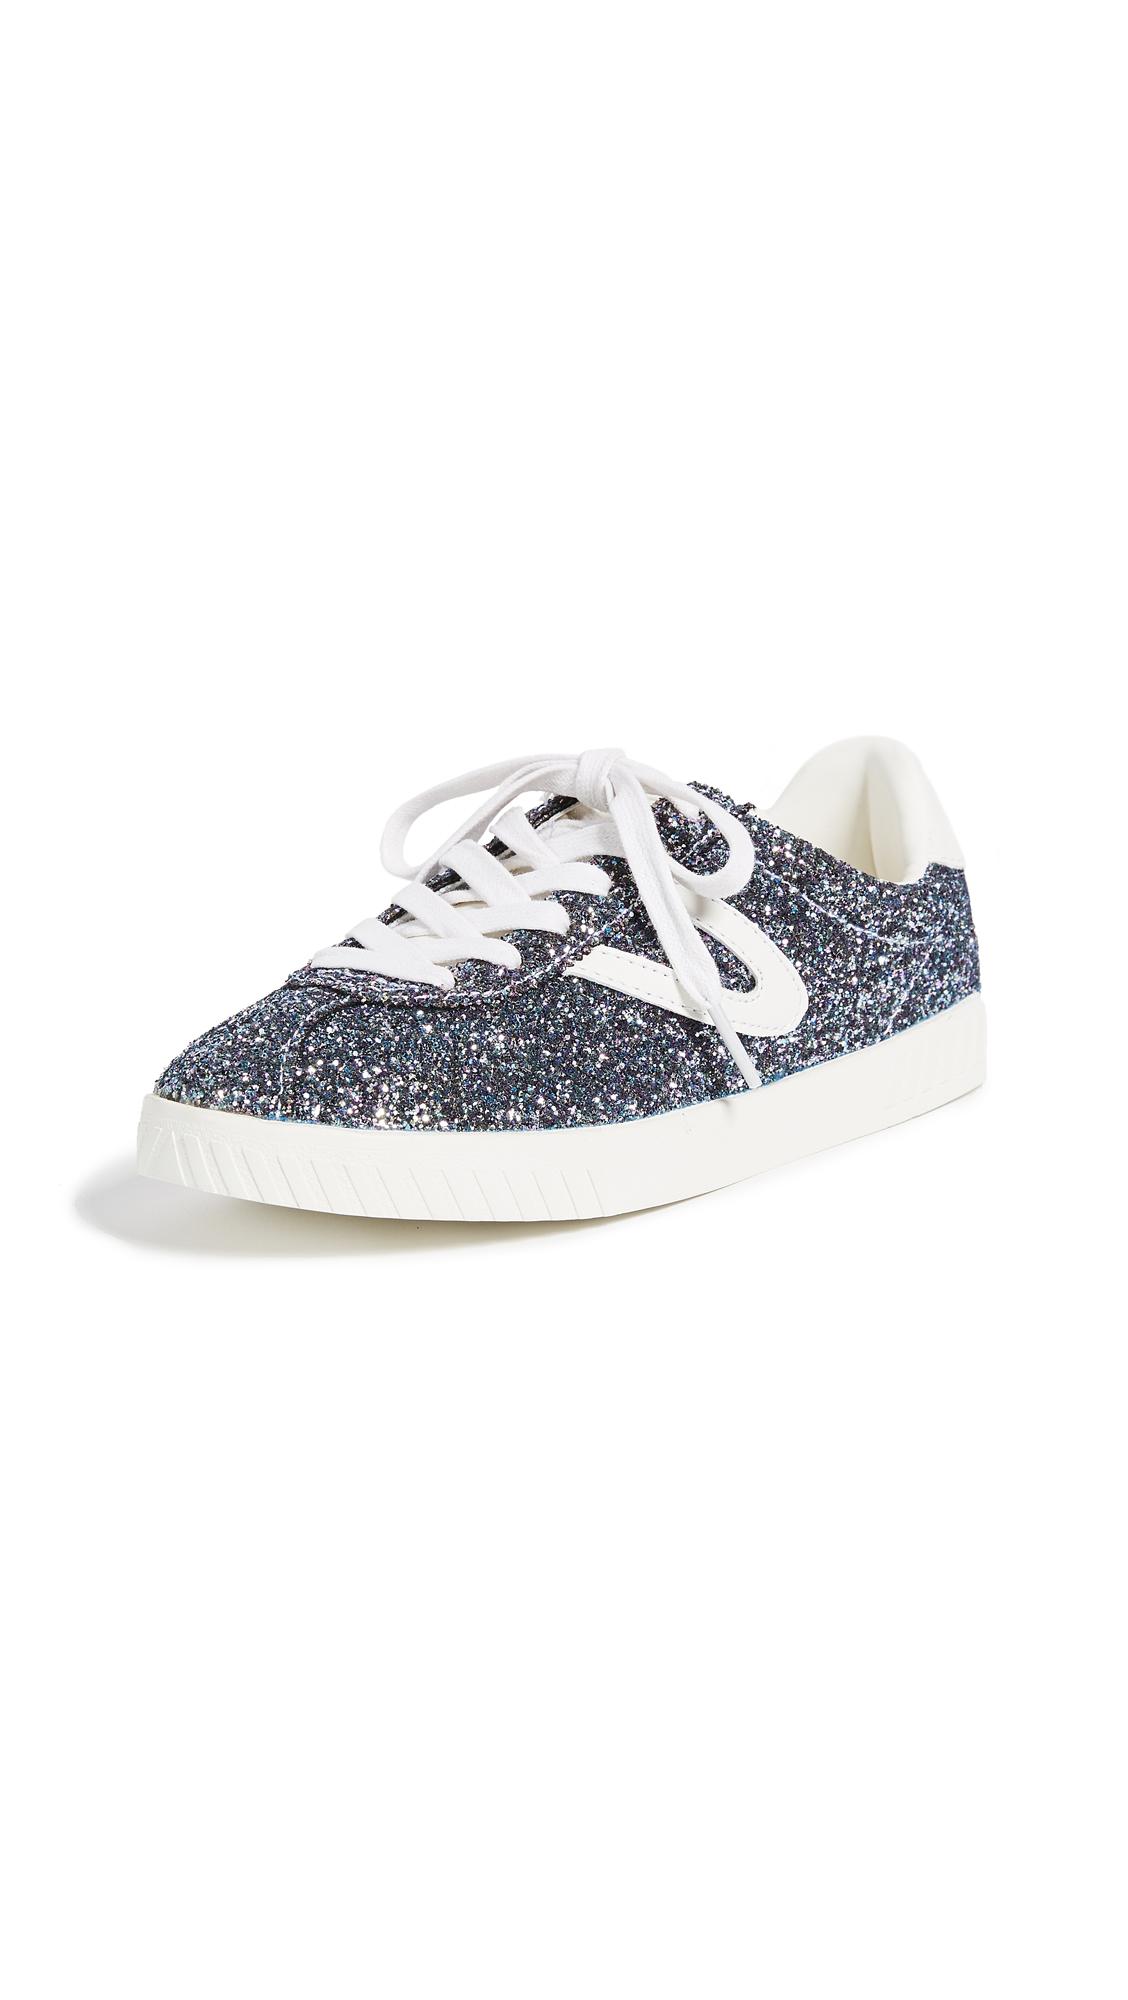 Tretorn Camden Classic Sneakers - Blue Multi/White